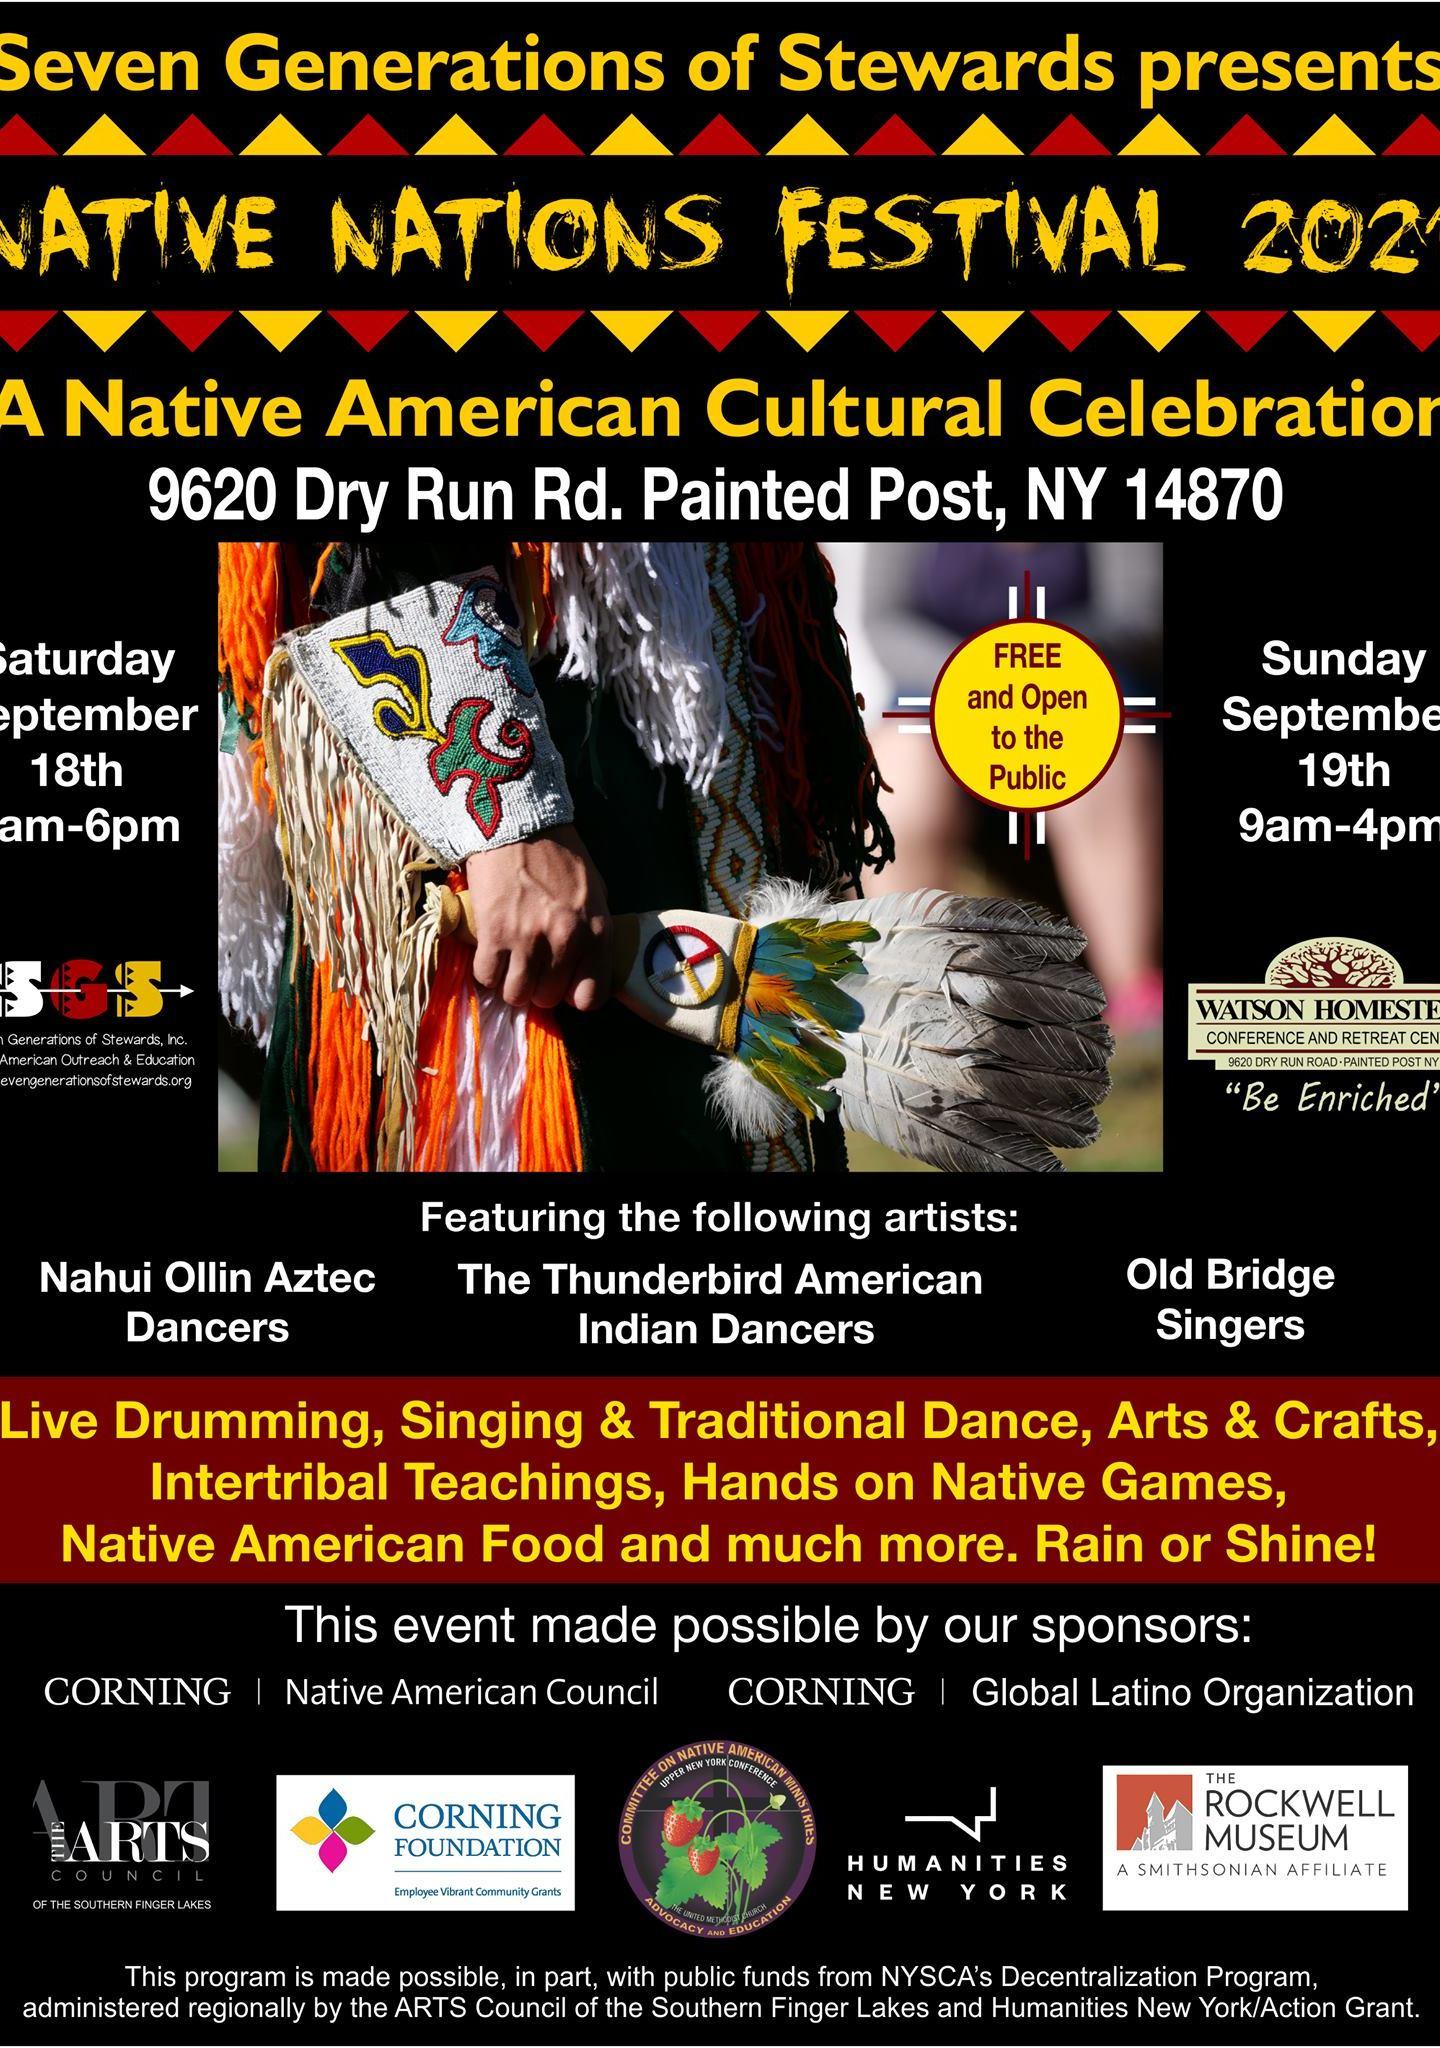 Native-Nations-Festival